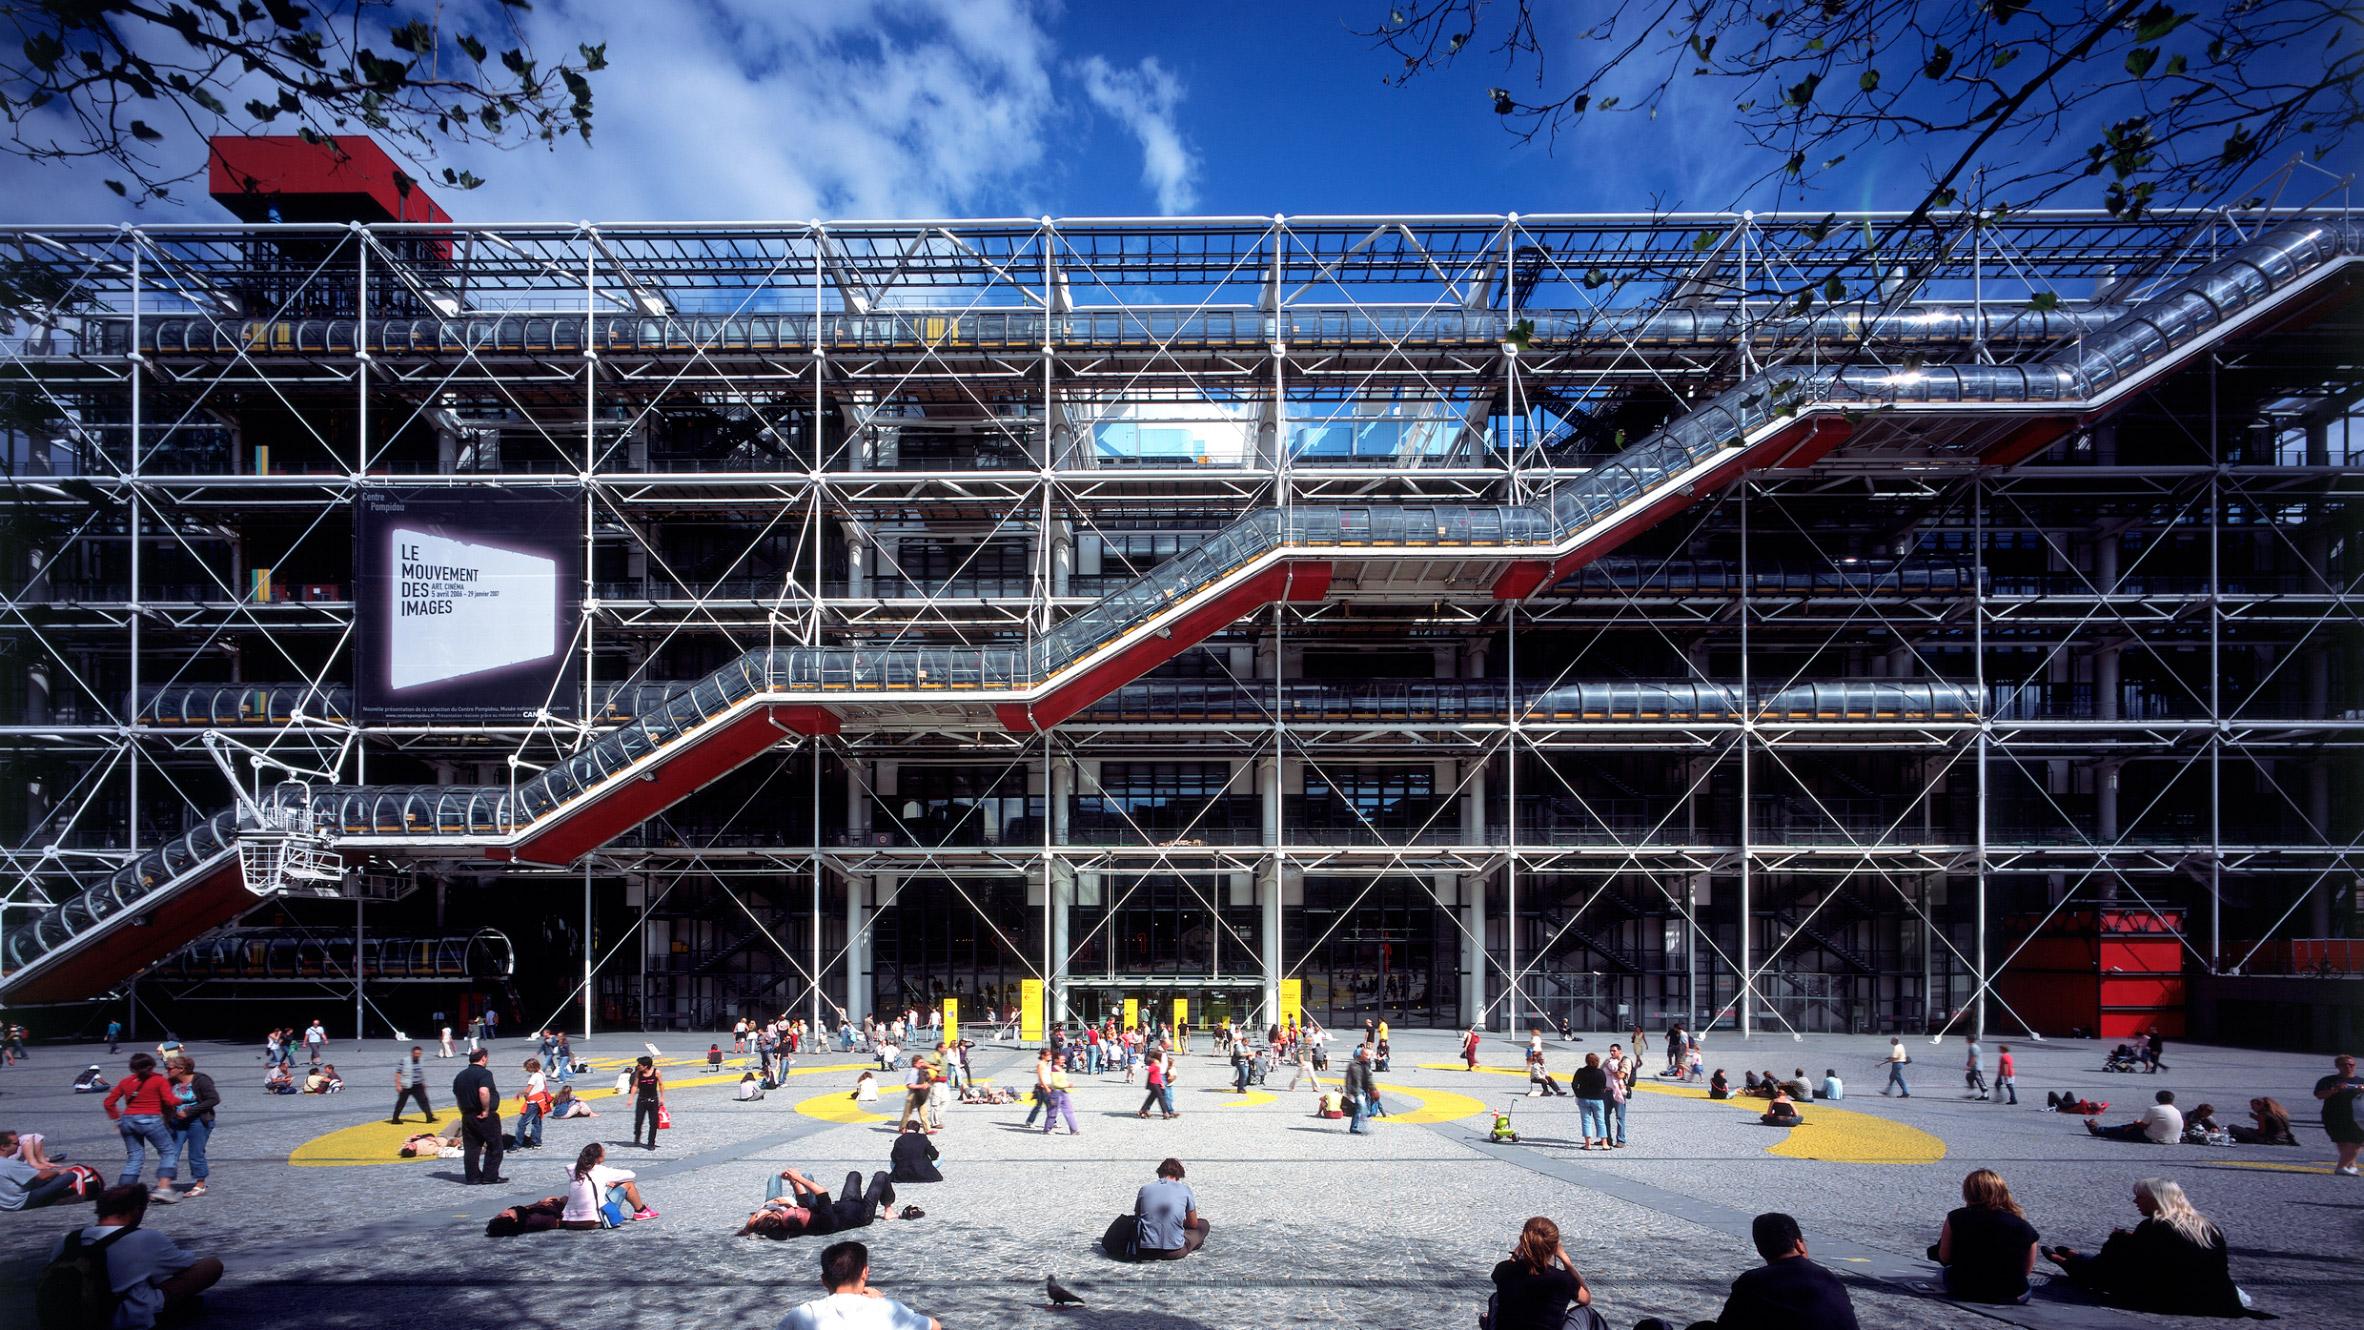 Richard Rogers top 10 architecture projects: Centre Pompidou